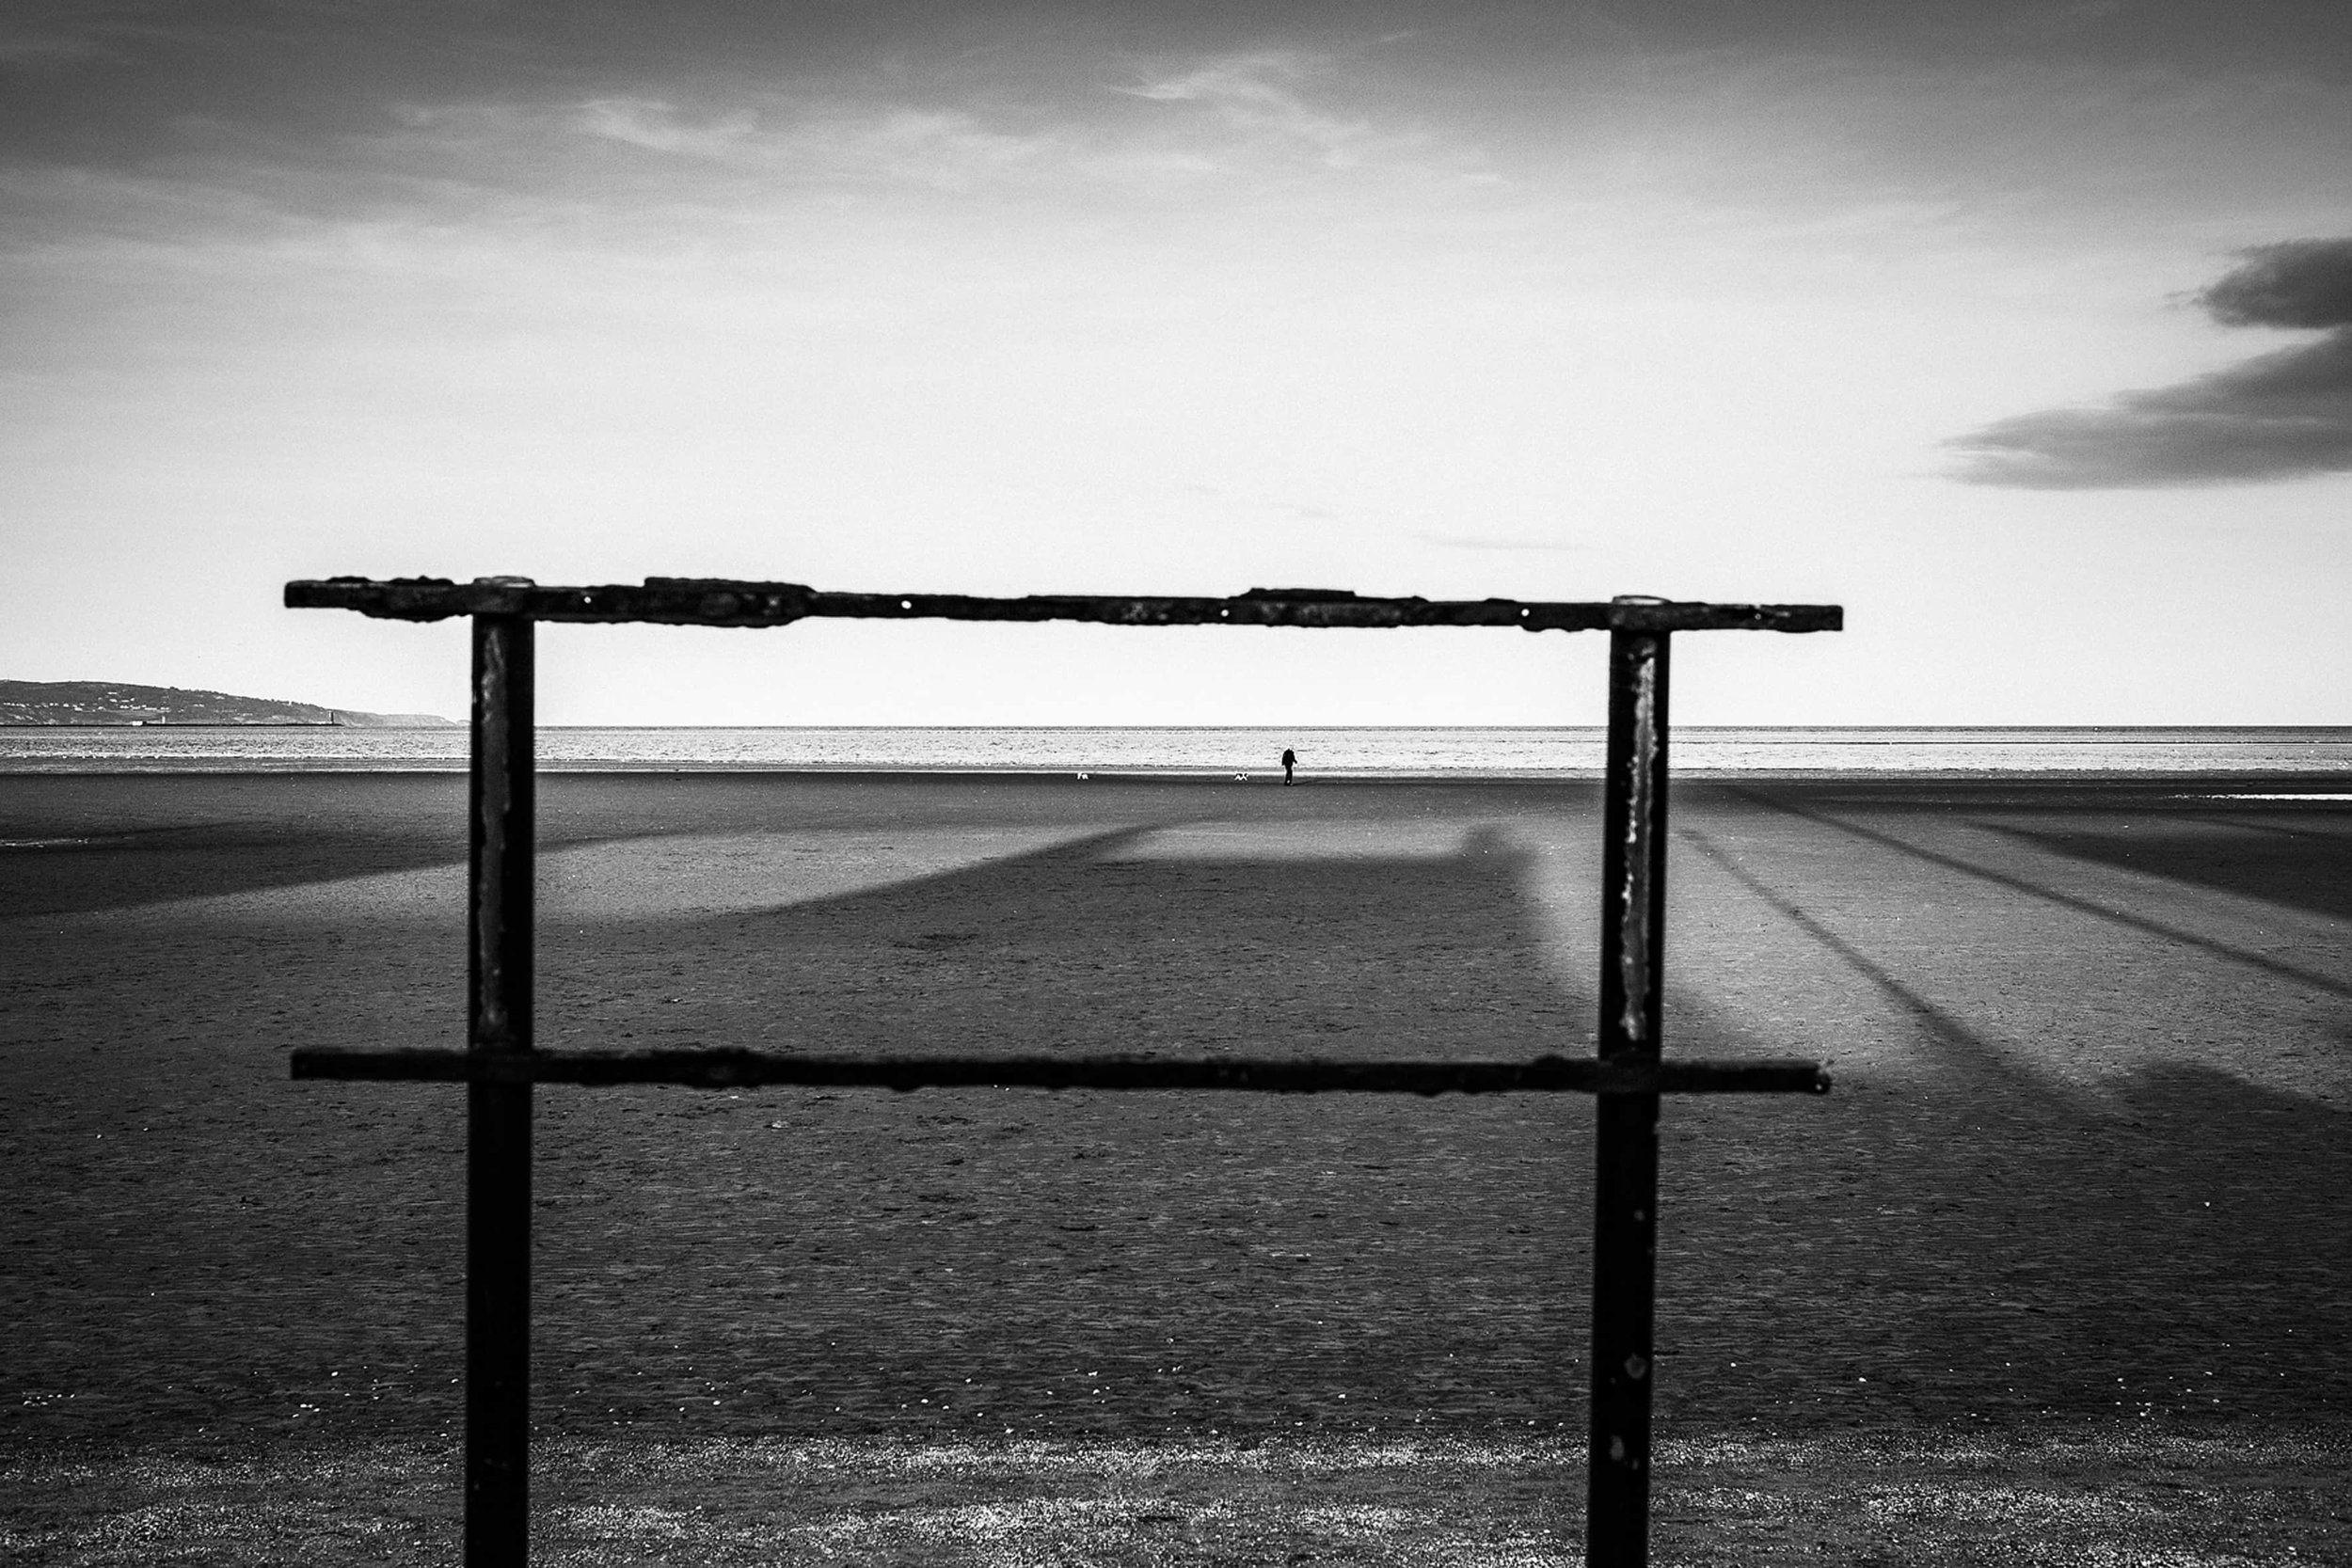 street-documentary-photography-fabio-burrelli-4.jpg